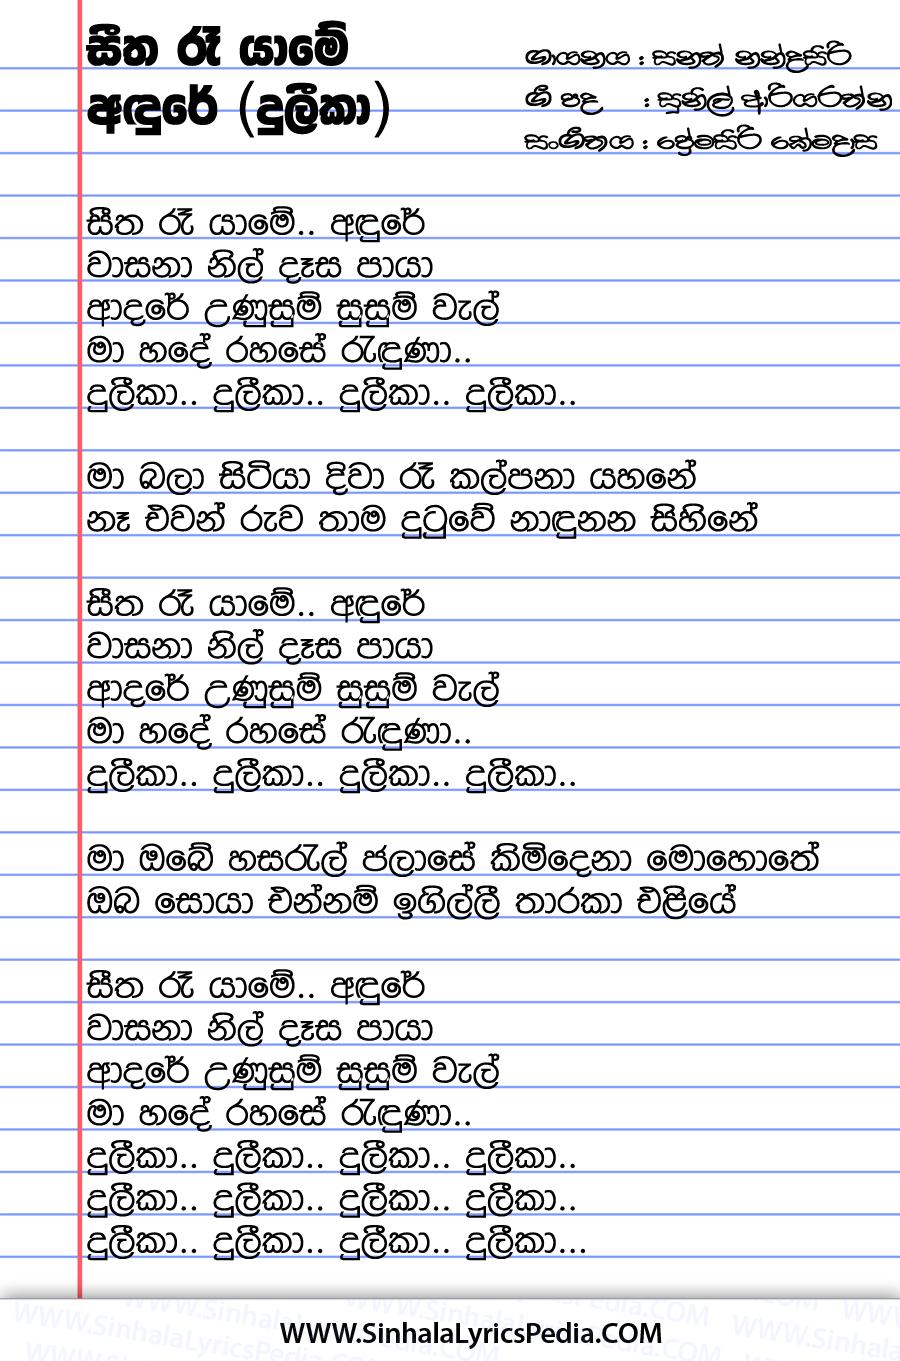 Seetha Re Yame (Duleeka) Song Lyrics